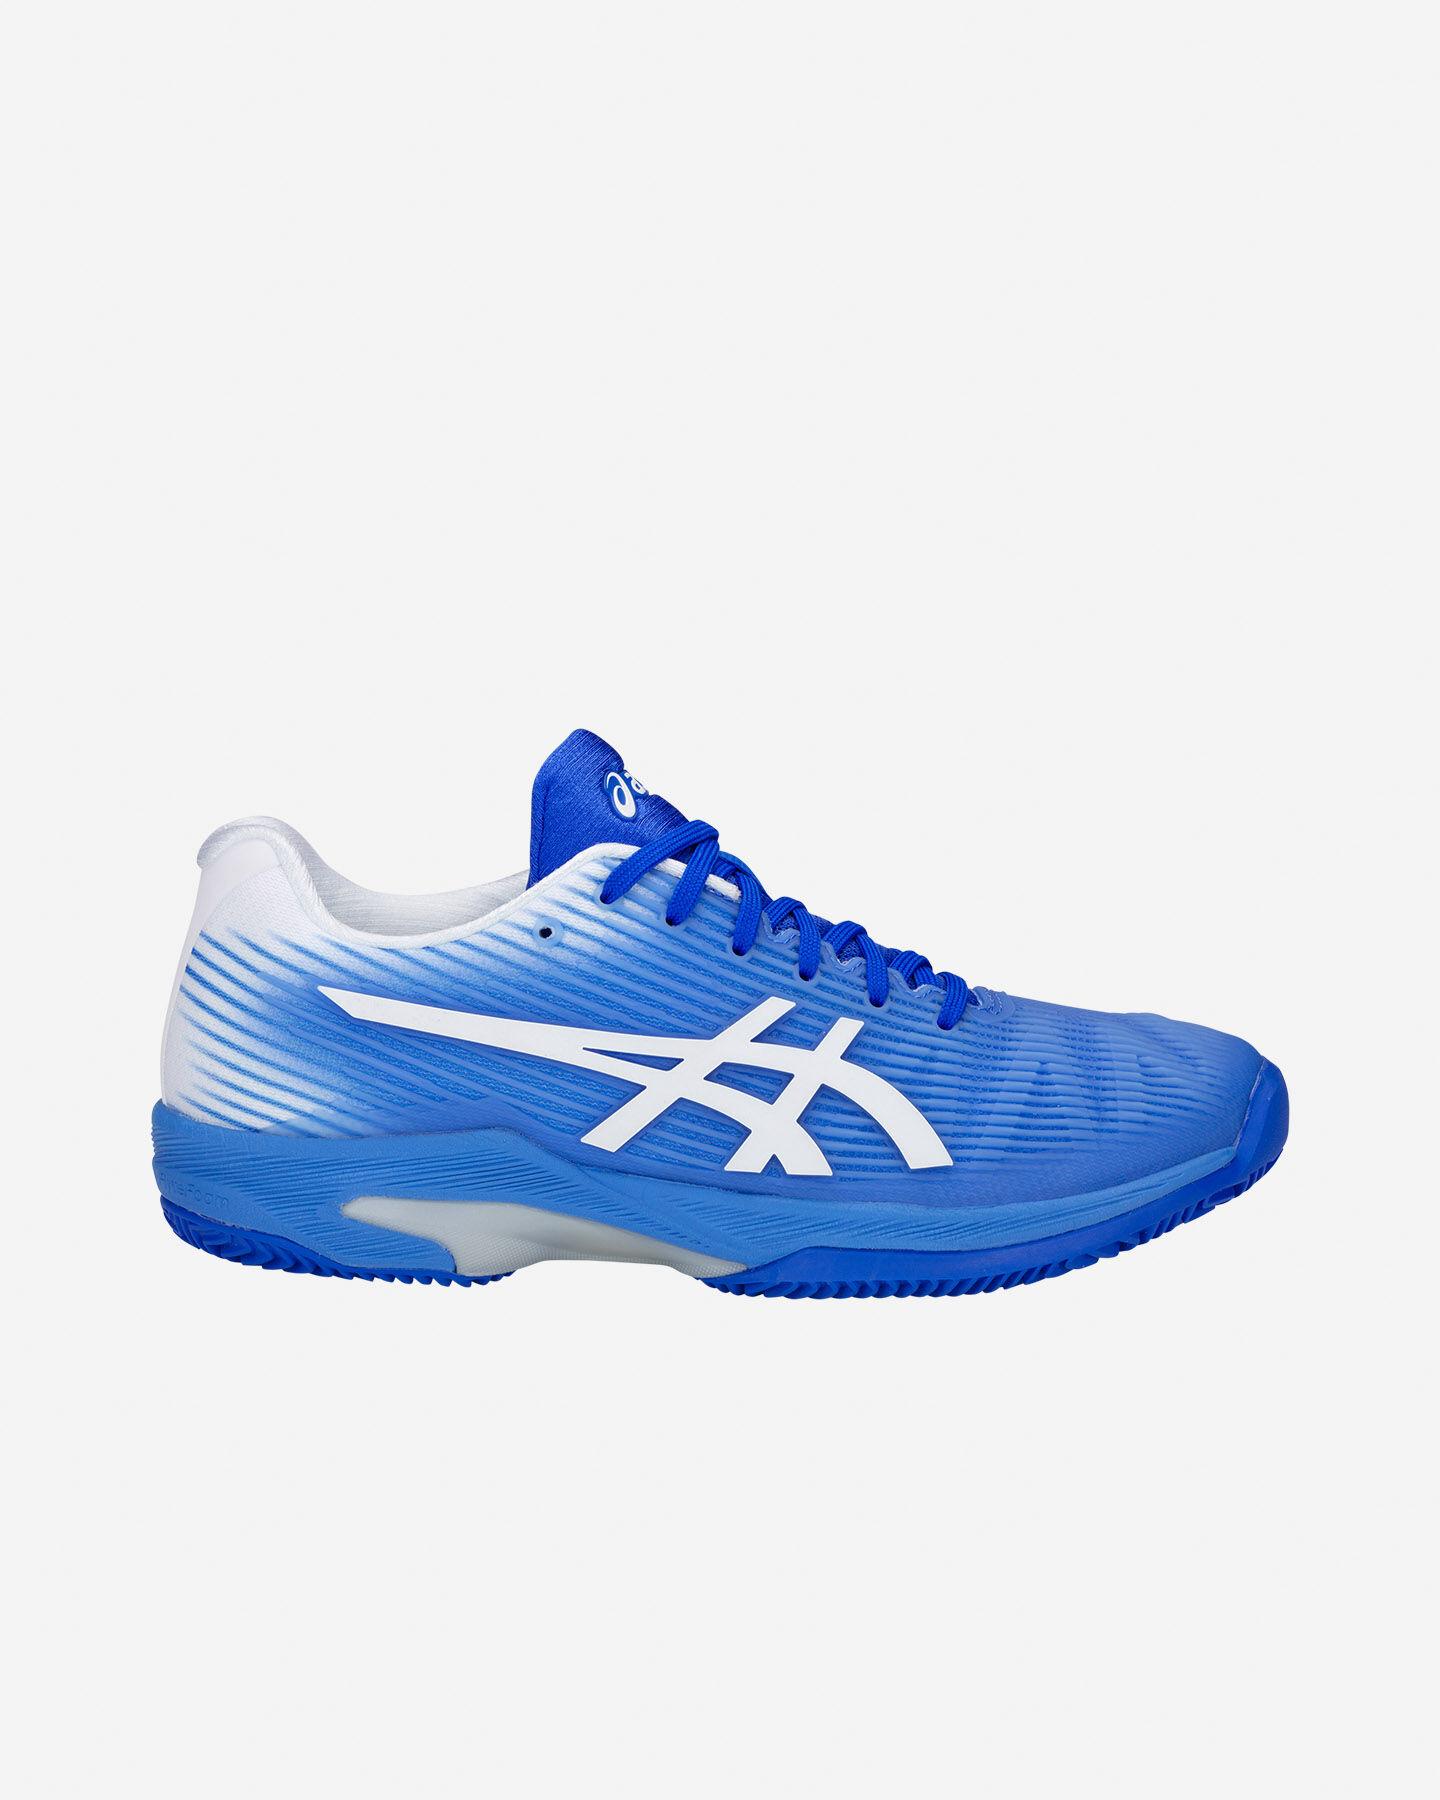 Scarponi Infradito Ciaspole Scarpe Sport Donna Sneakers Cisalfa xqZEwntw84